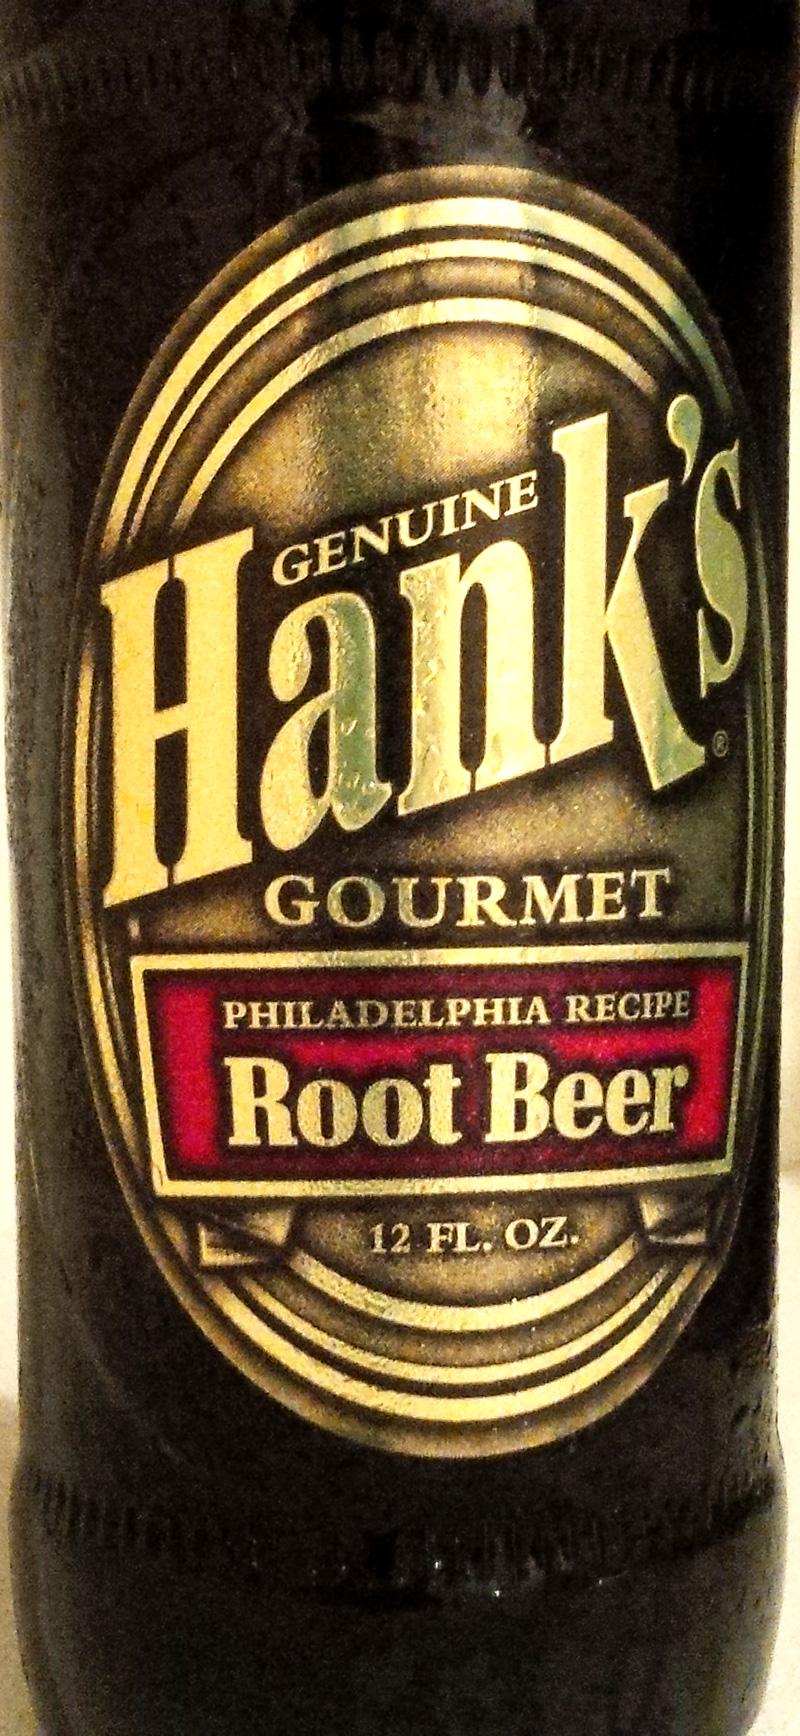 Genuine Hank's Gourmet Philadelphia Recipe